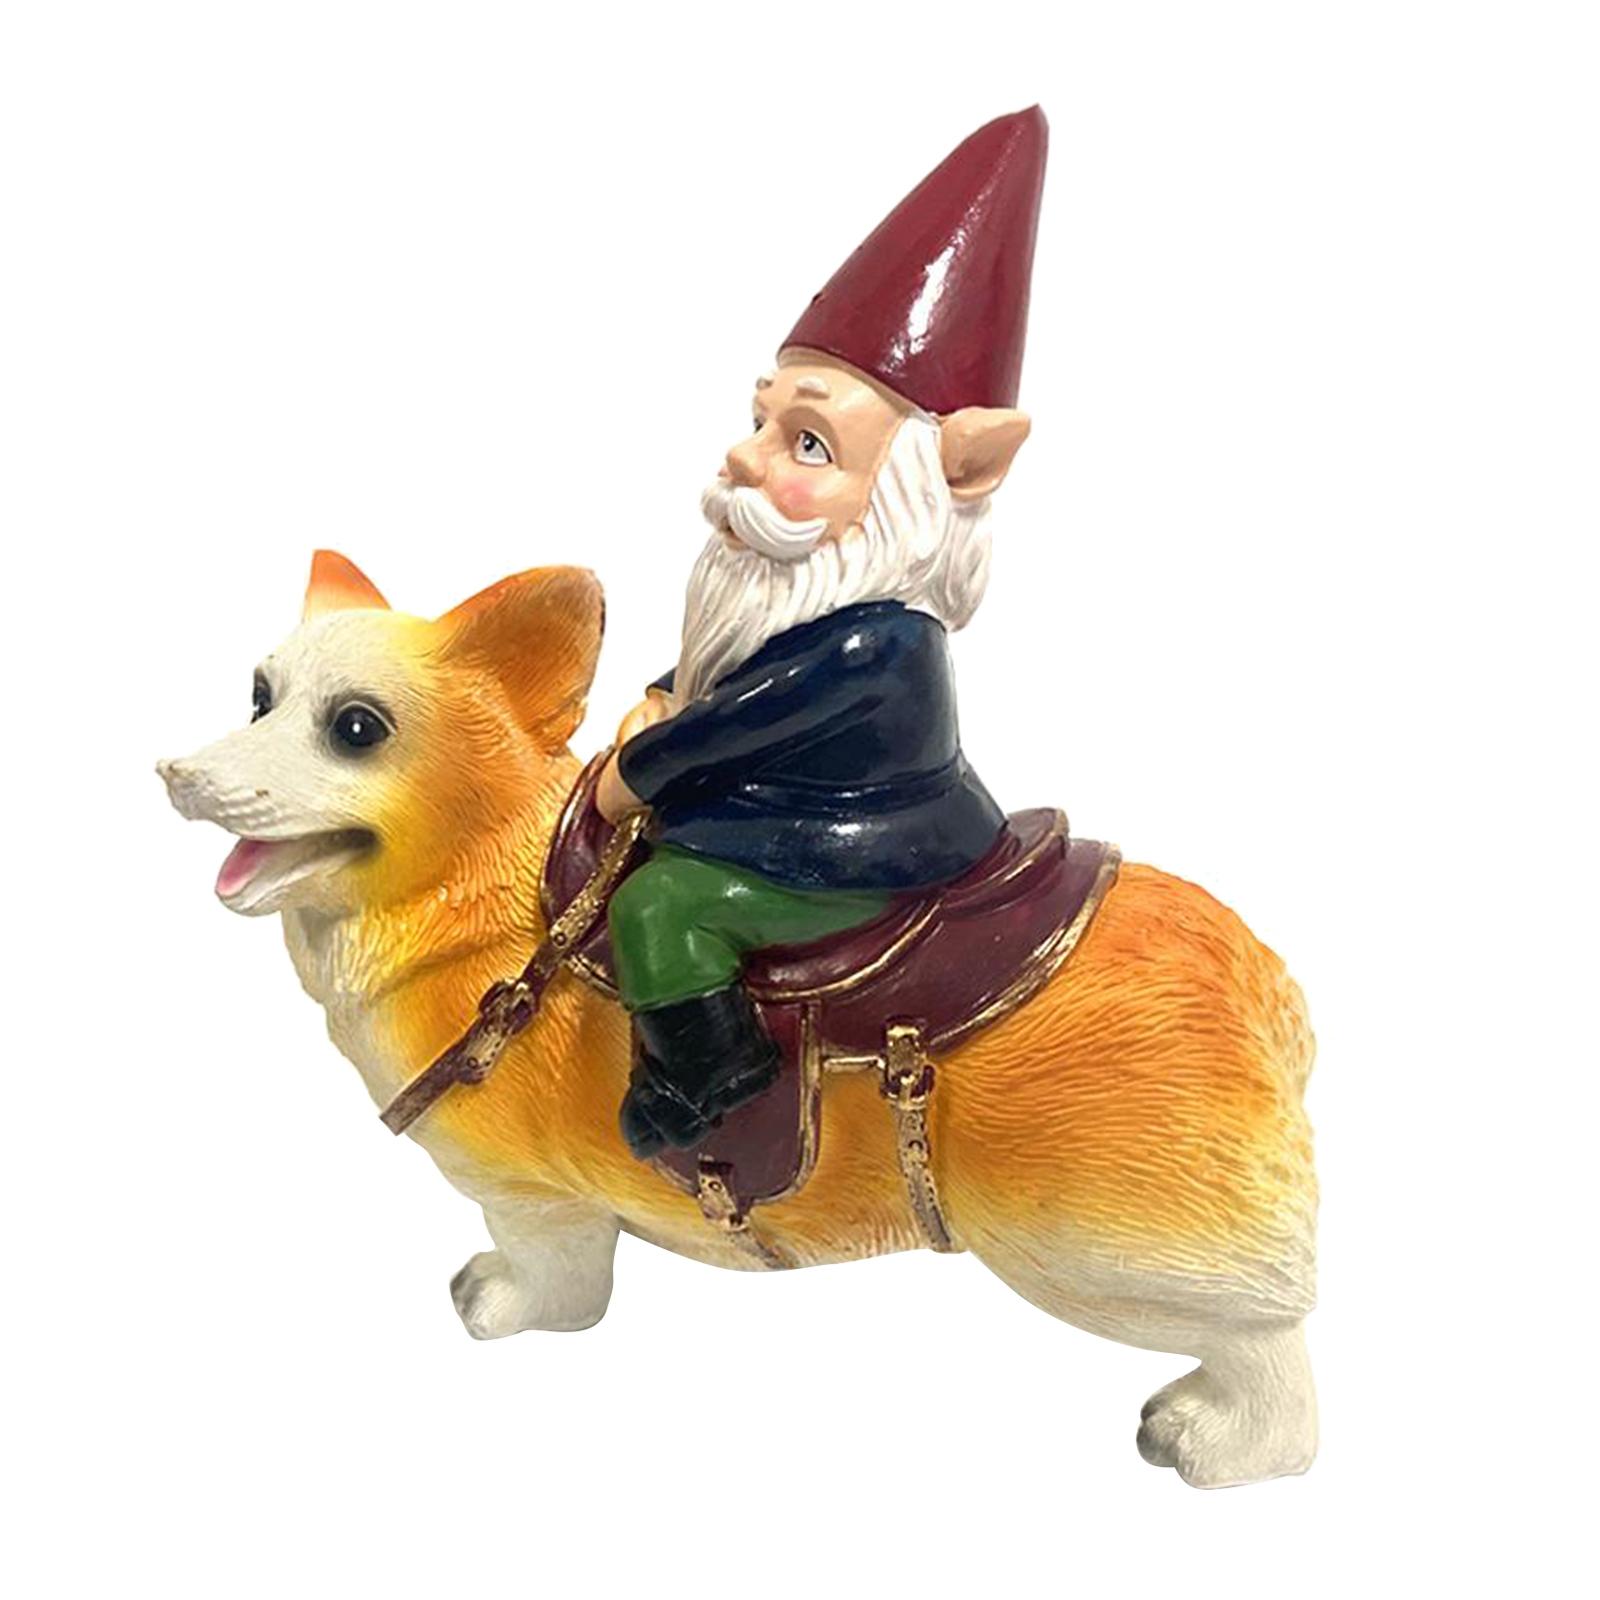 thumbnail 31 - Funny Resin Naughty Garden Gnome Statue Ornaments Villa Home Figurines Decor AU